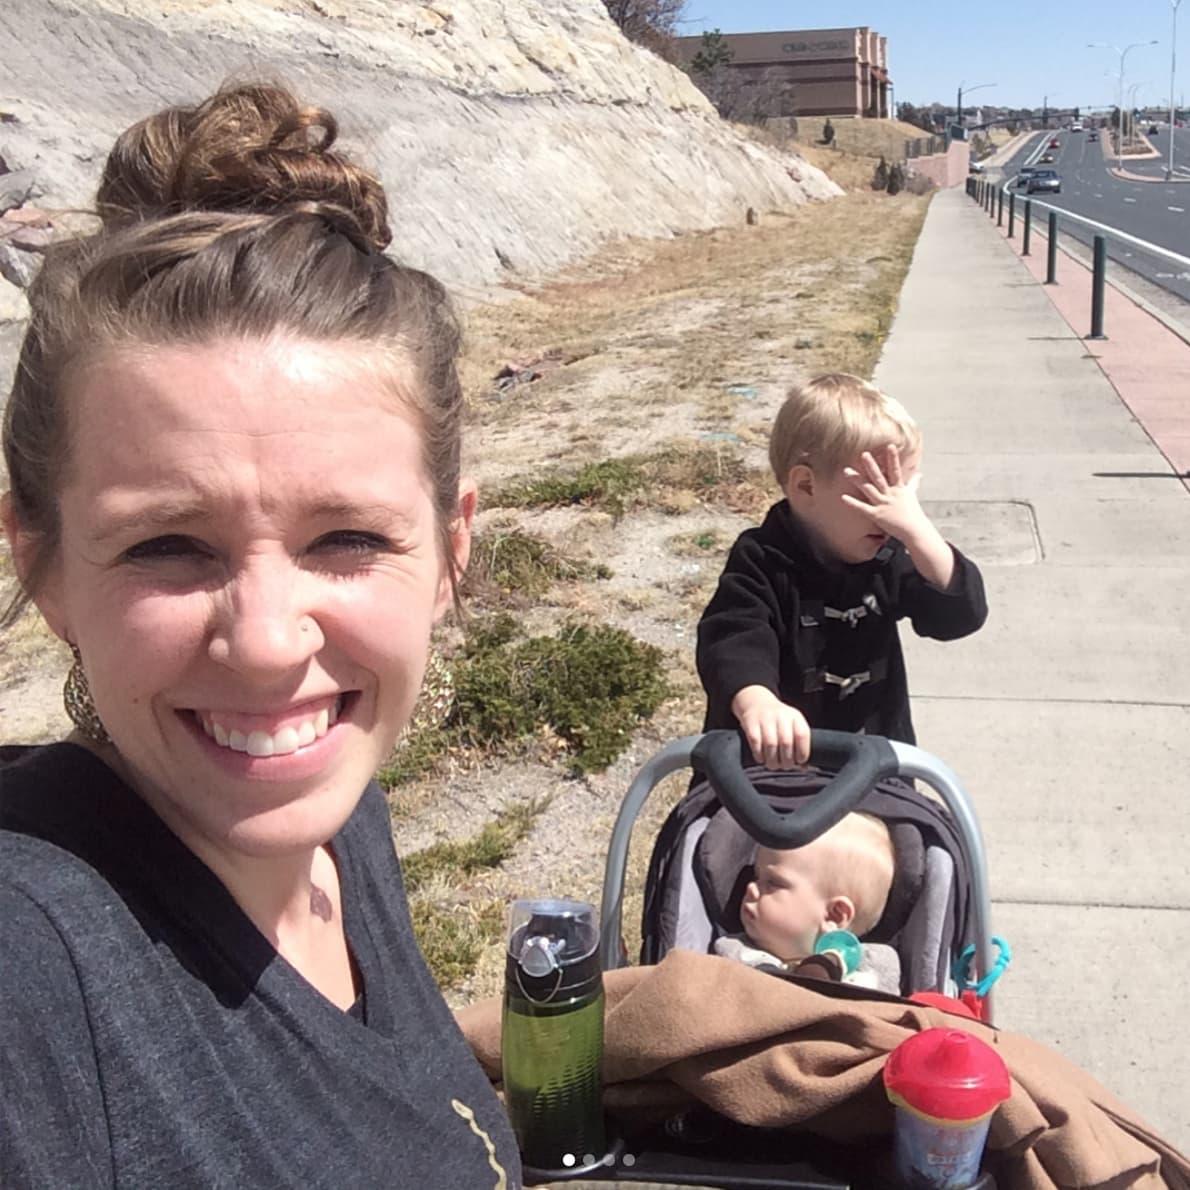 People Are Slamming Jill Duggar for Her Dangerous Stroller Hack